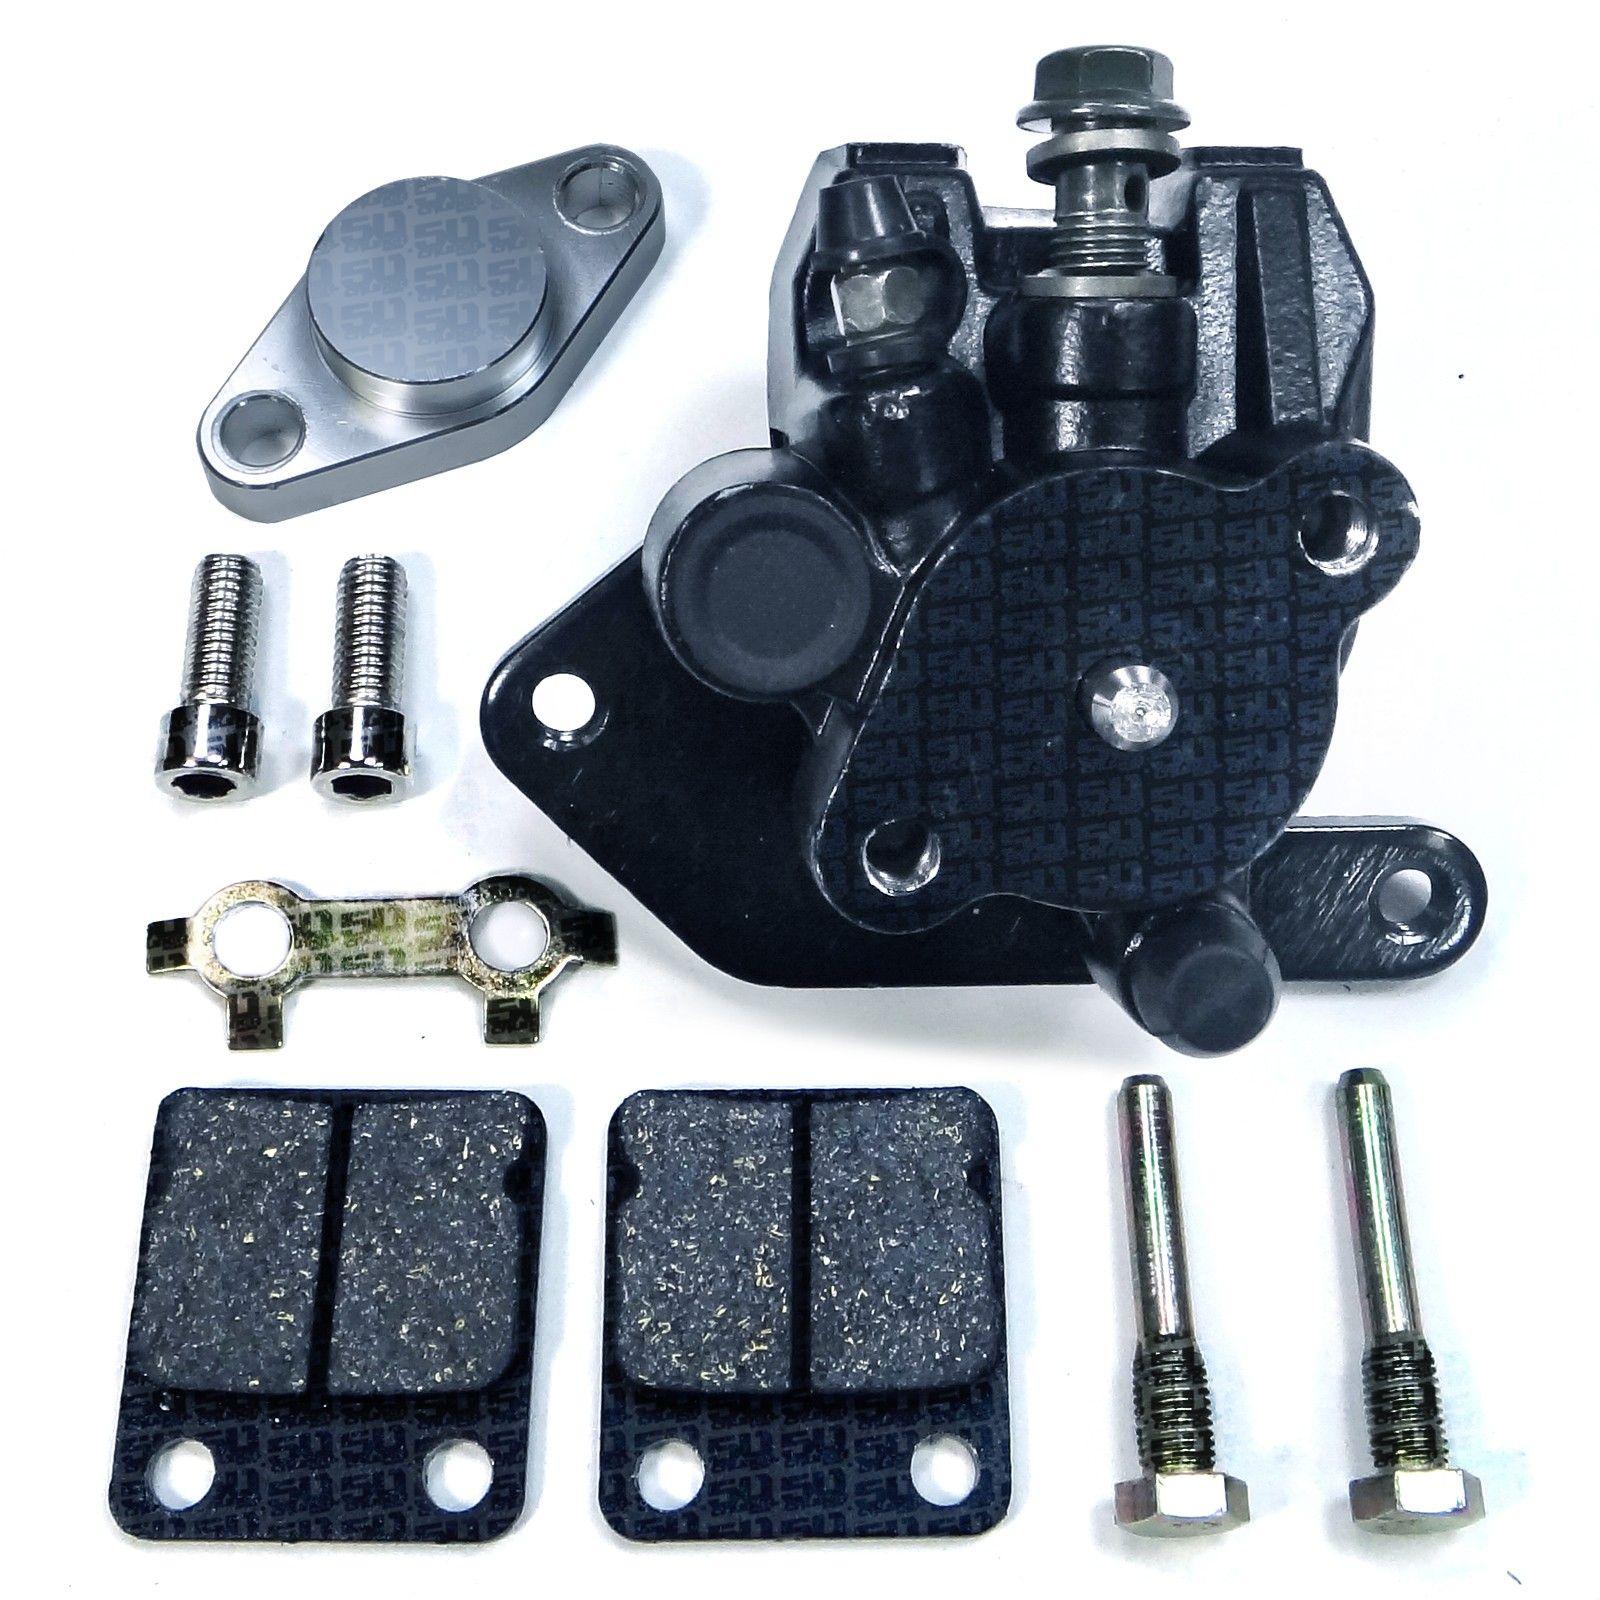 2010 2011 2012 2013 fits Yamaha Raptor 350 YFM350 Clutch Cable